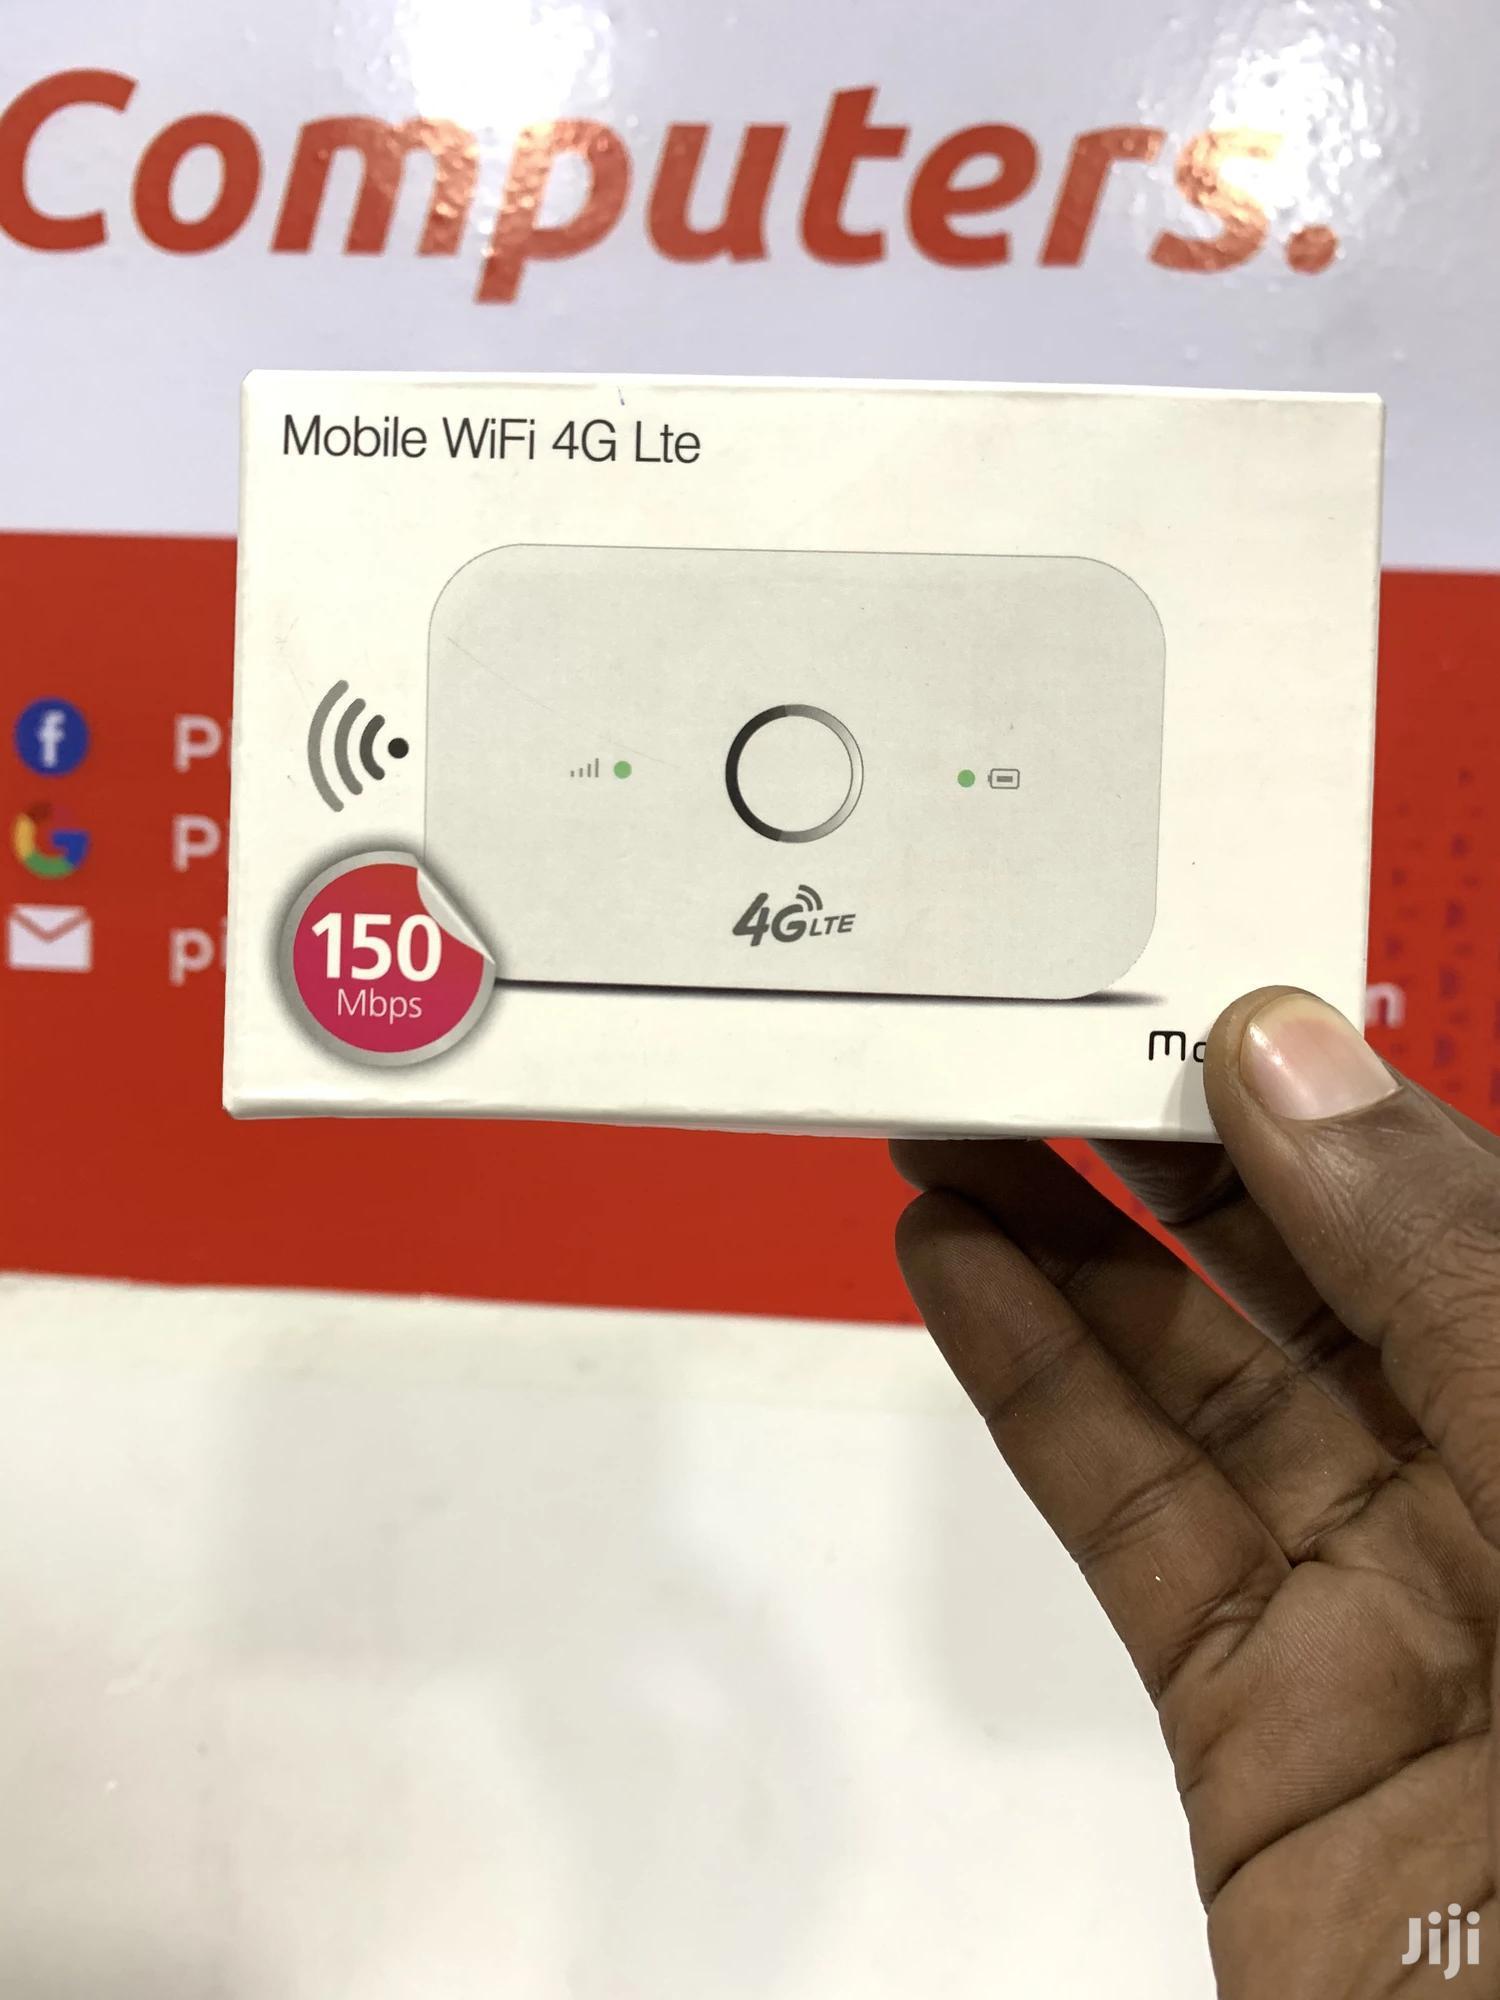 Mobile Wi-Fi 4G LTE Router